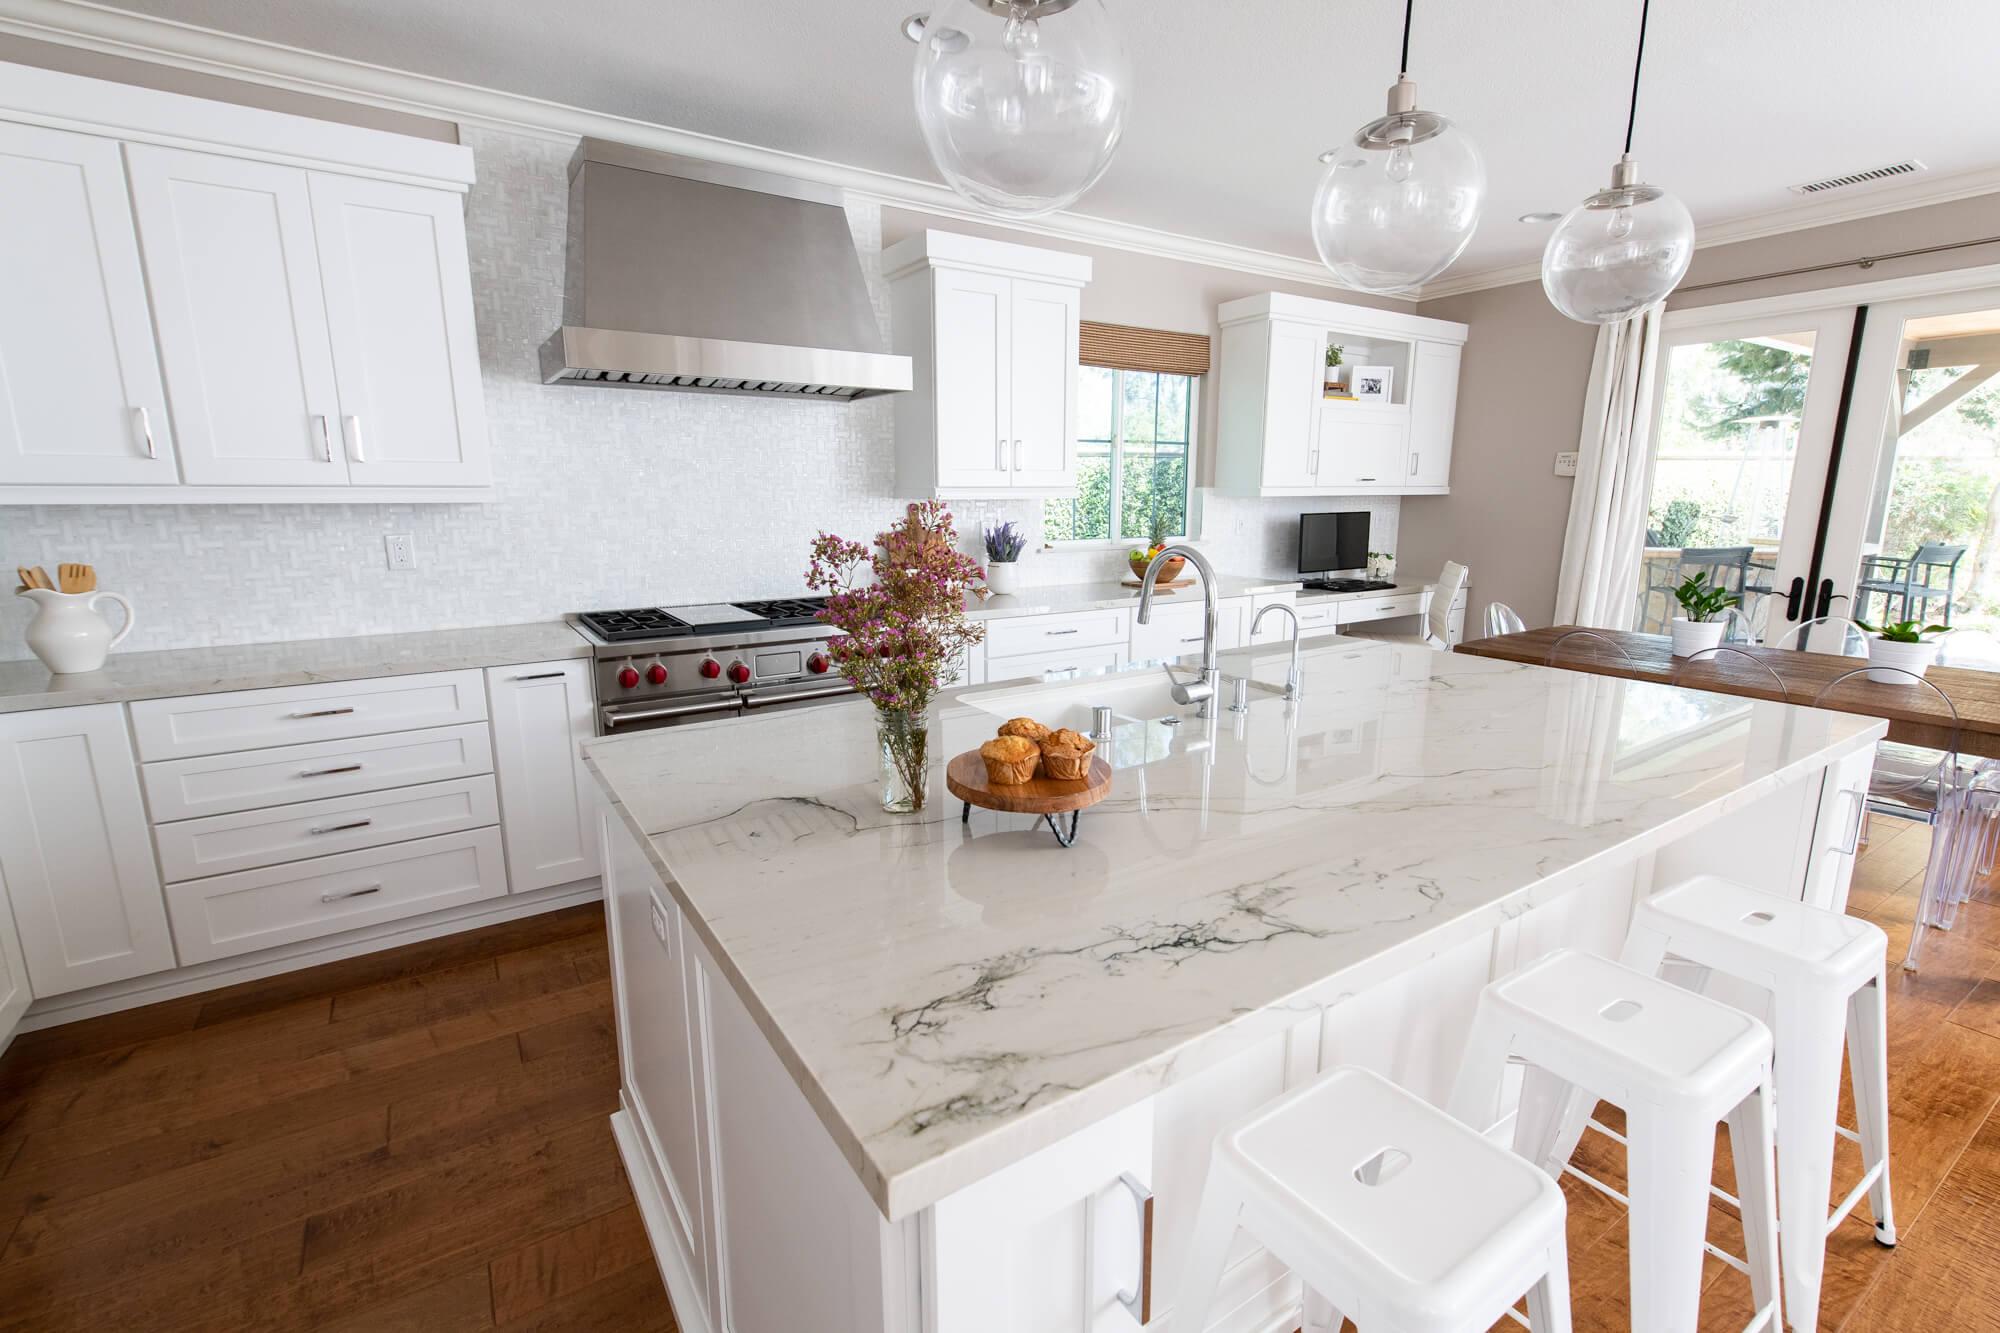 quartz-stone-countertop-with-vein-design-in-remodel